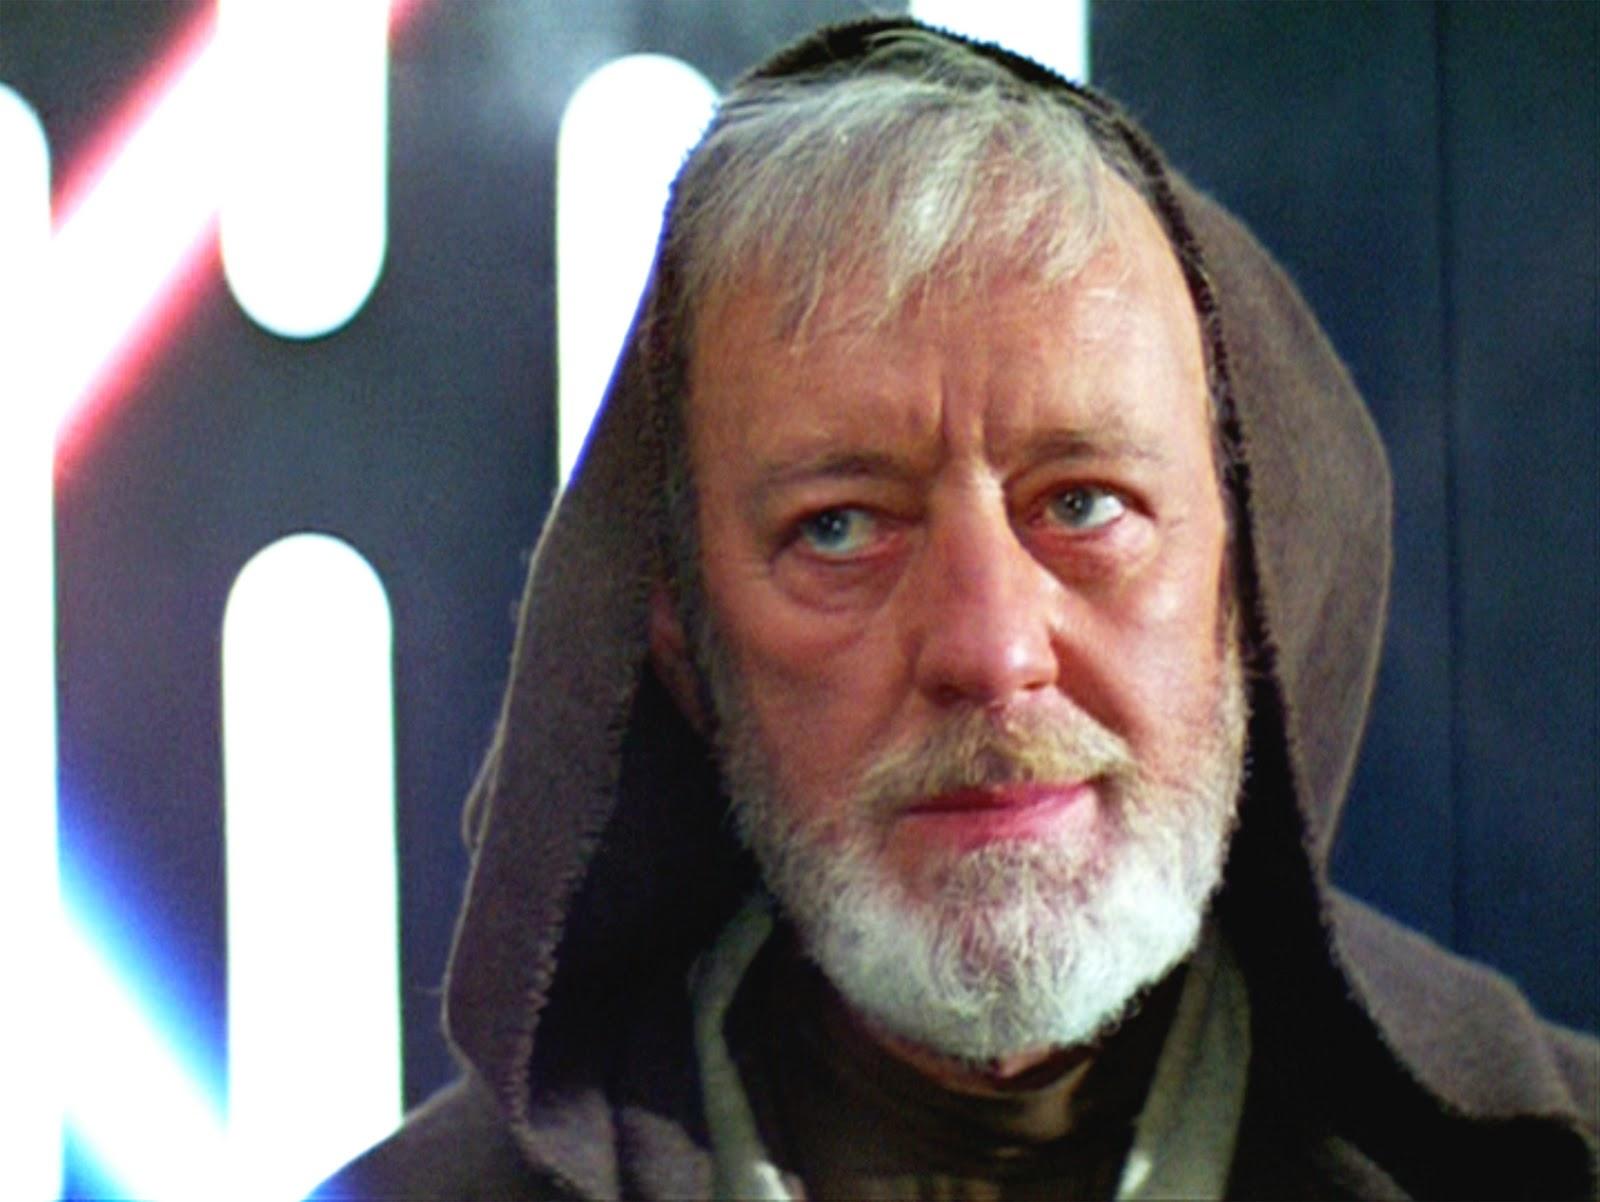 Star Wars Obi Wan Movie The Movie Star Wars